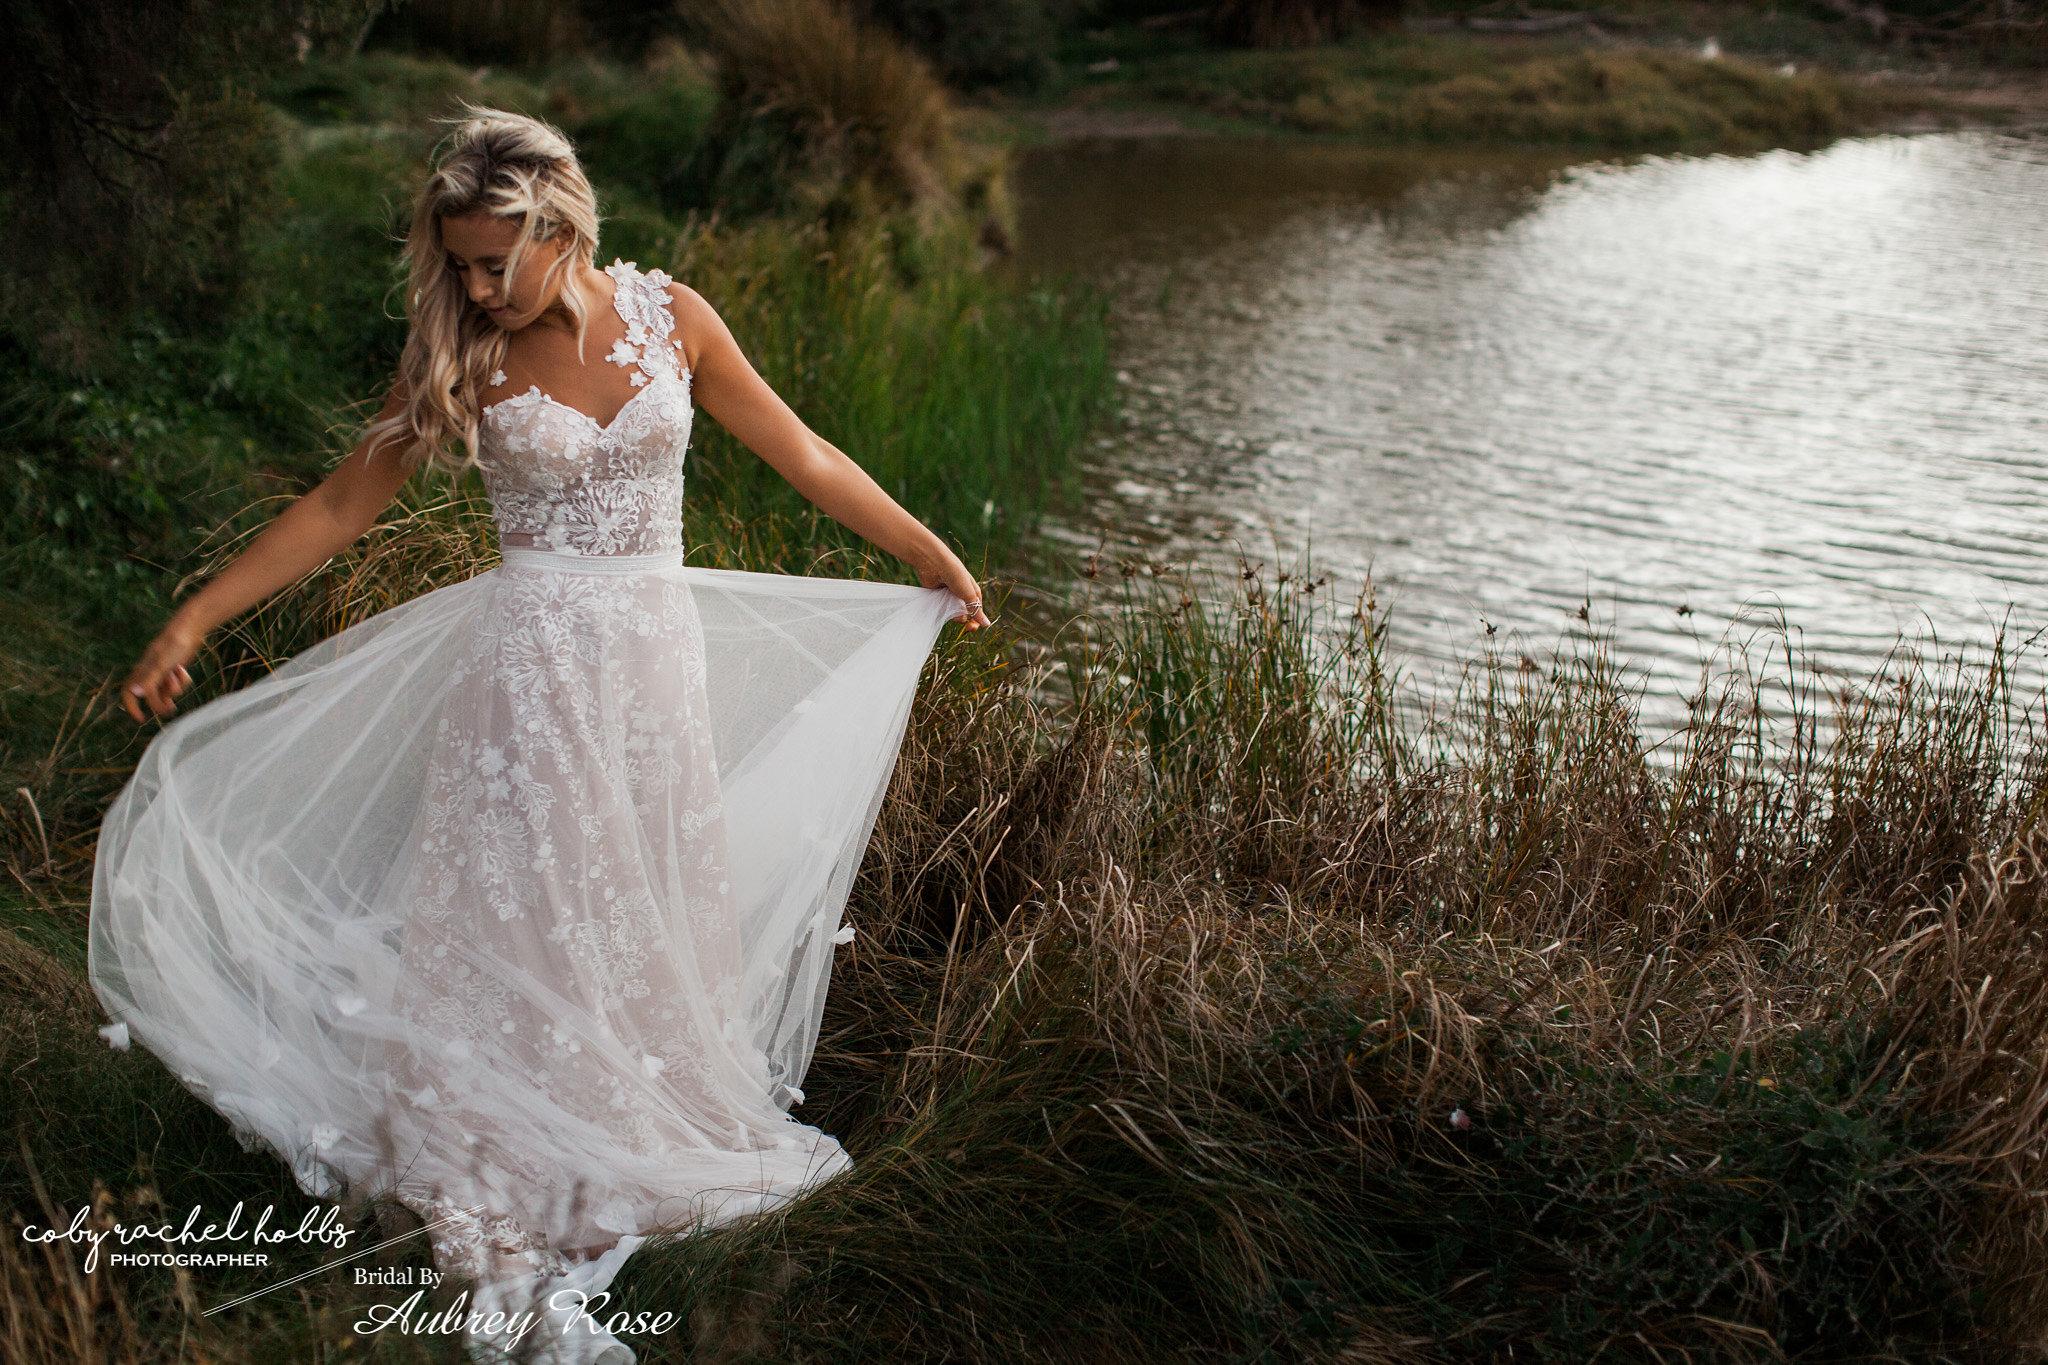 cobyrachelhobbs-bridalbyaubreyrose-oldbroadwaterfarm-253.jpg